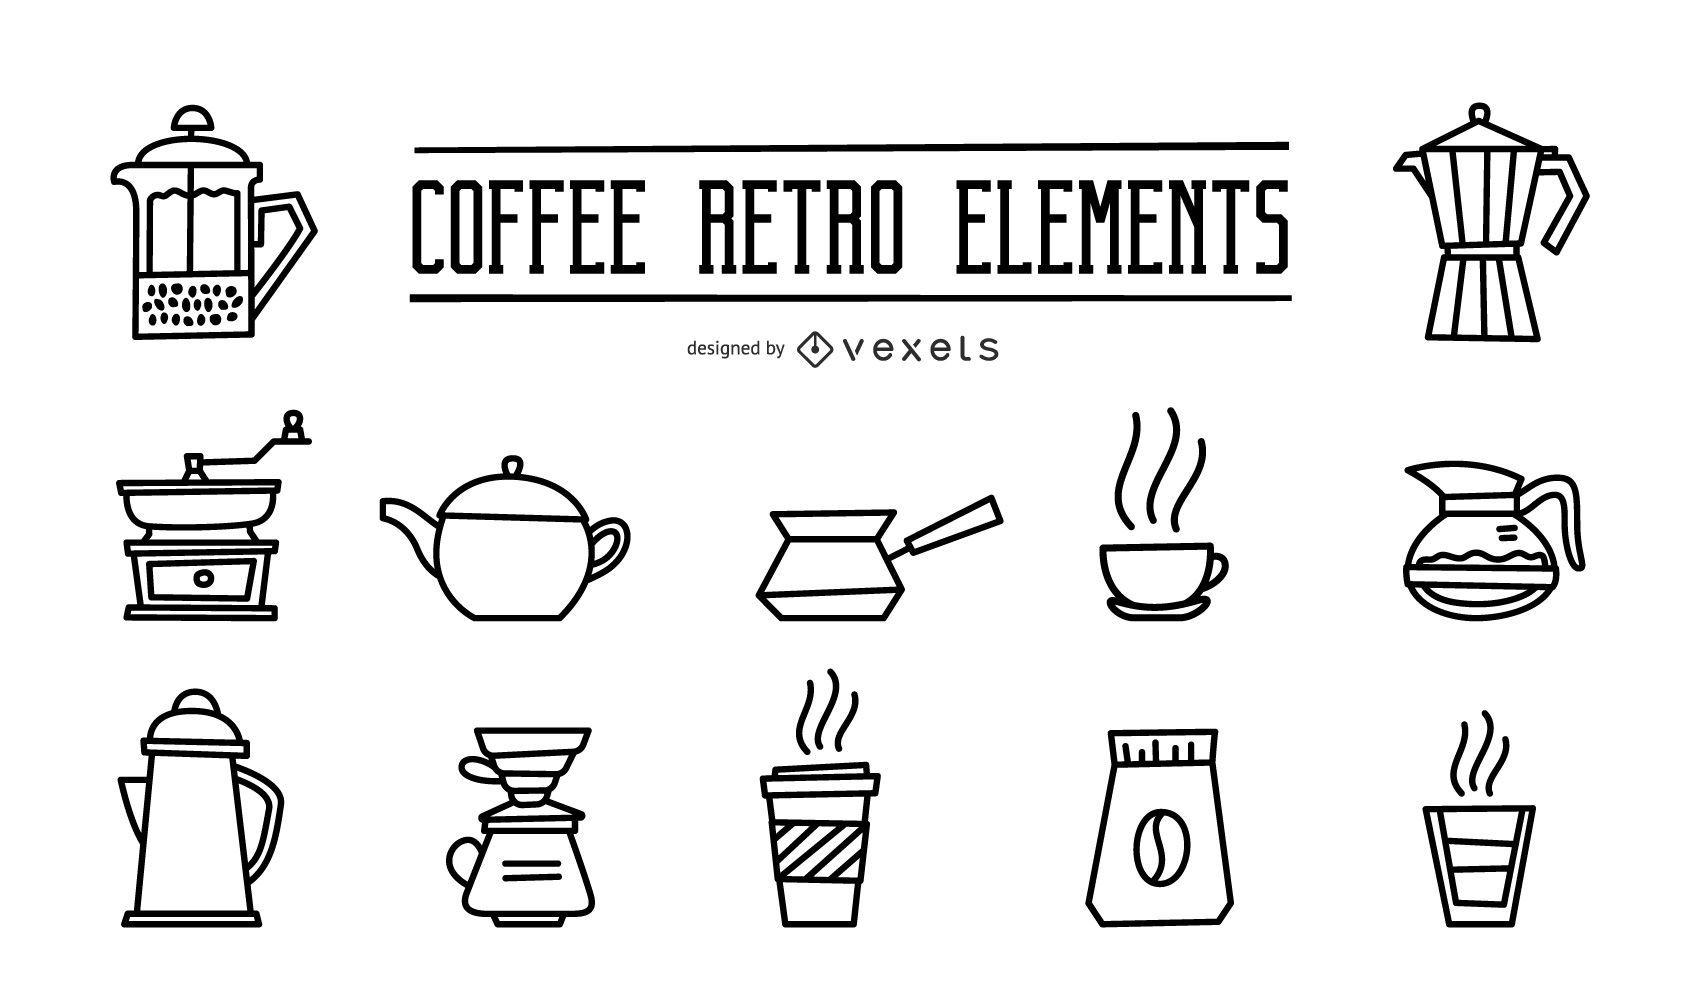 Coffee retro elements stroke set